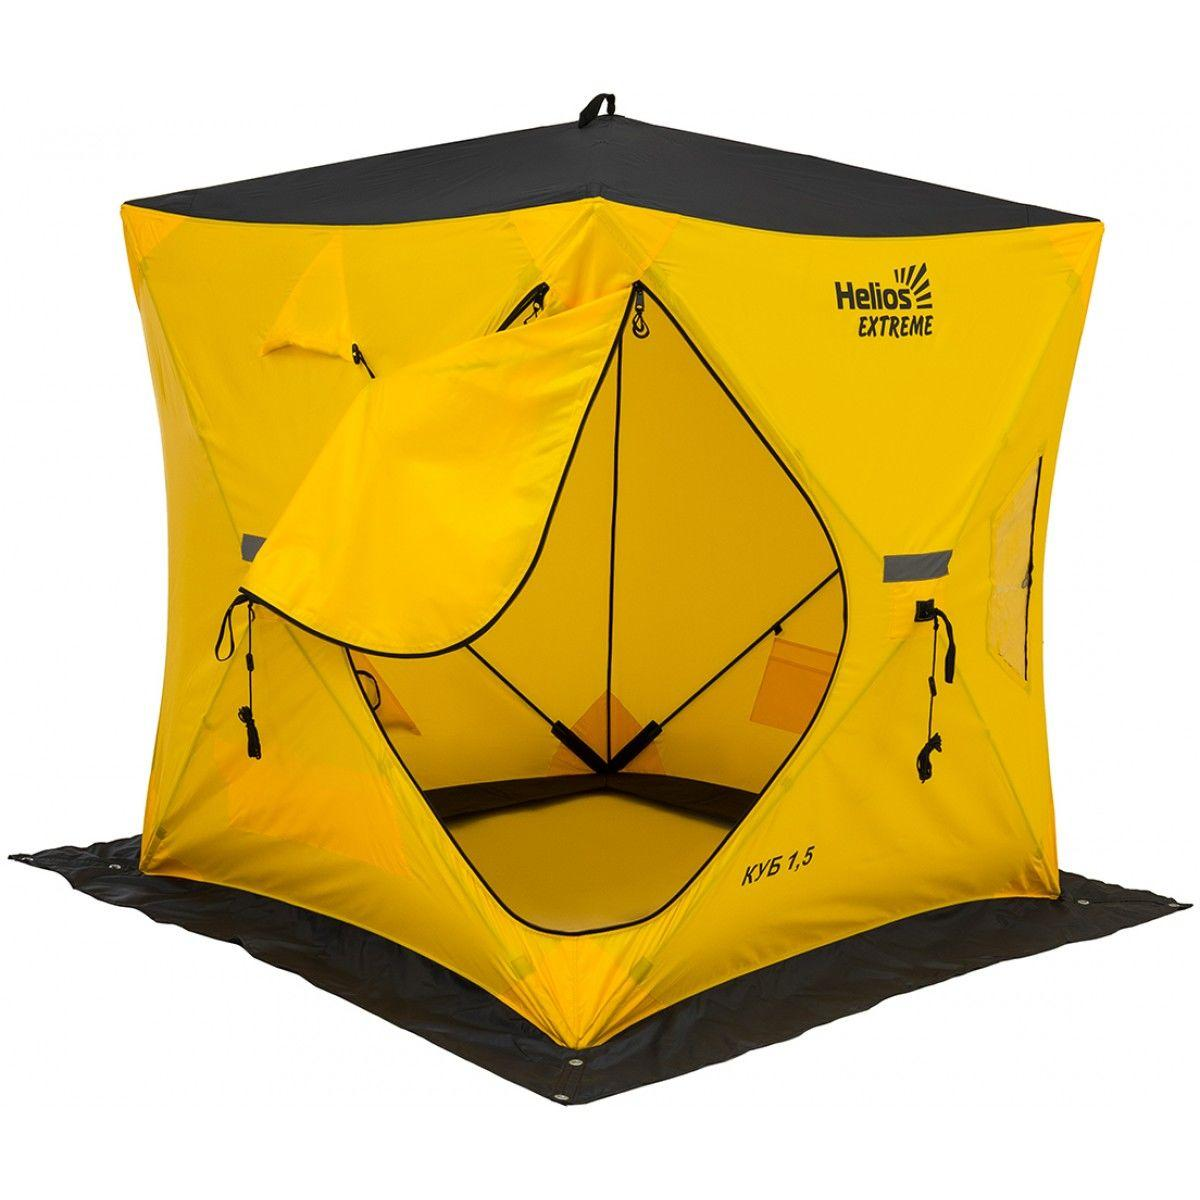 Палатка зимняя КУБ EXTREME 1,5х1,5 v2.0 (широкий вход) Helios 171395 - фото 9